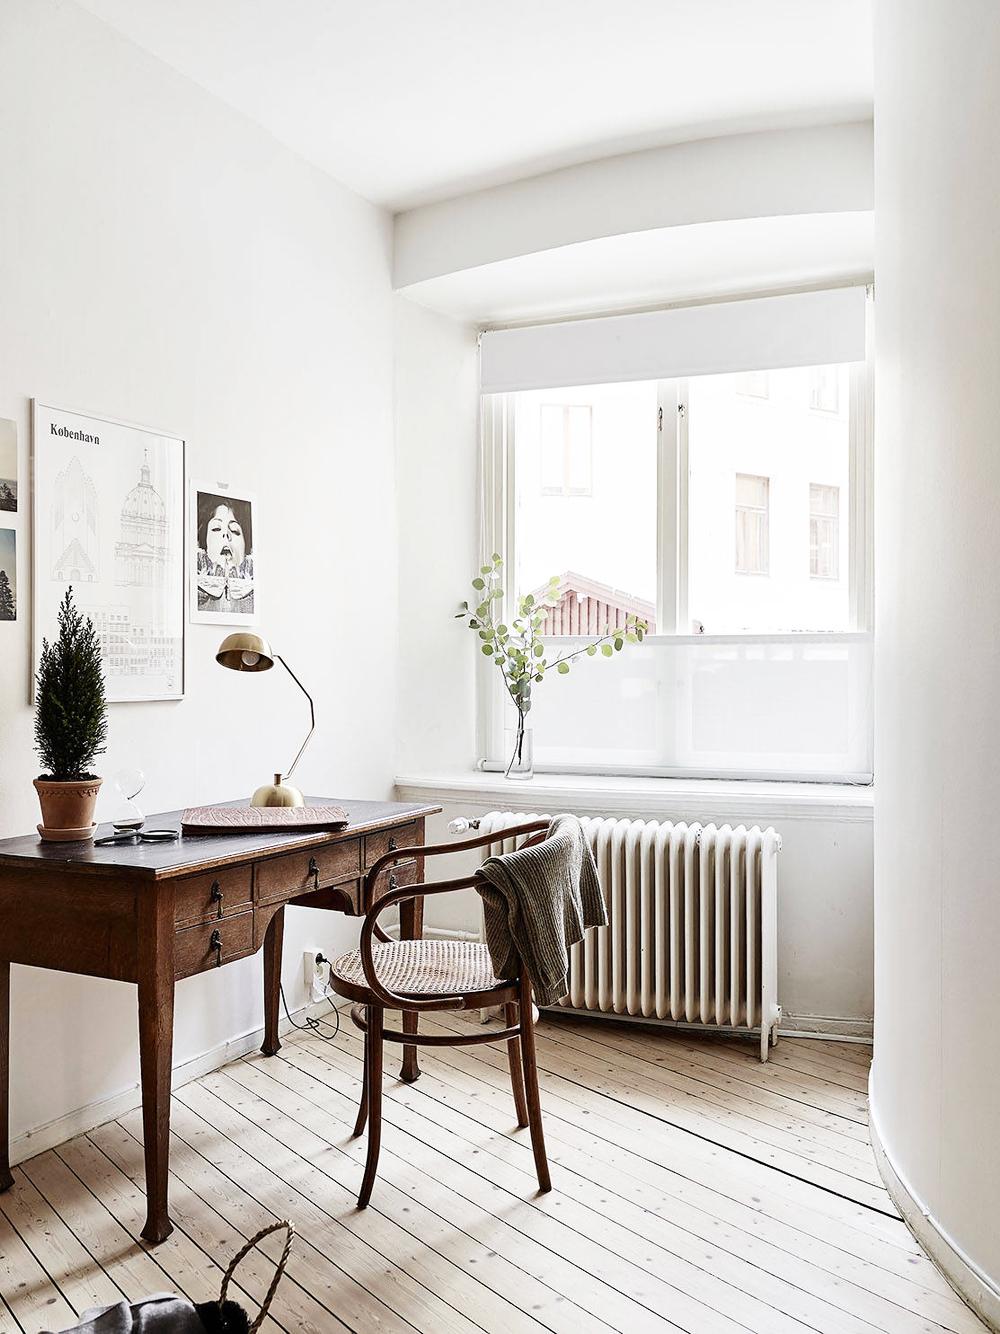 Oracle, Fox, Sunday, Sanctuary, Detail, Oriented, Black, and, white, Scandinavian, Interior, desk, Minimalism